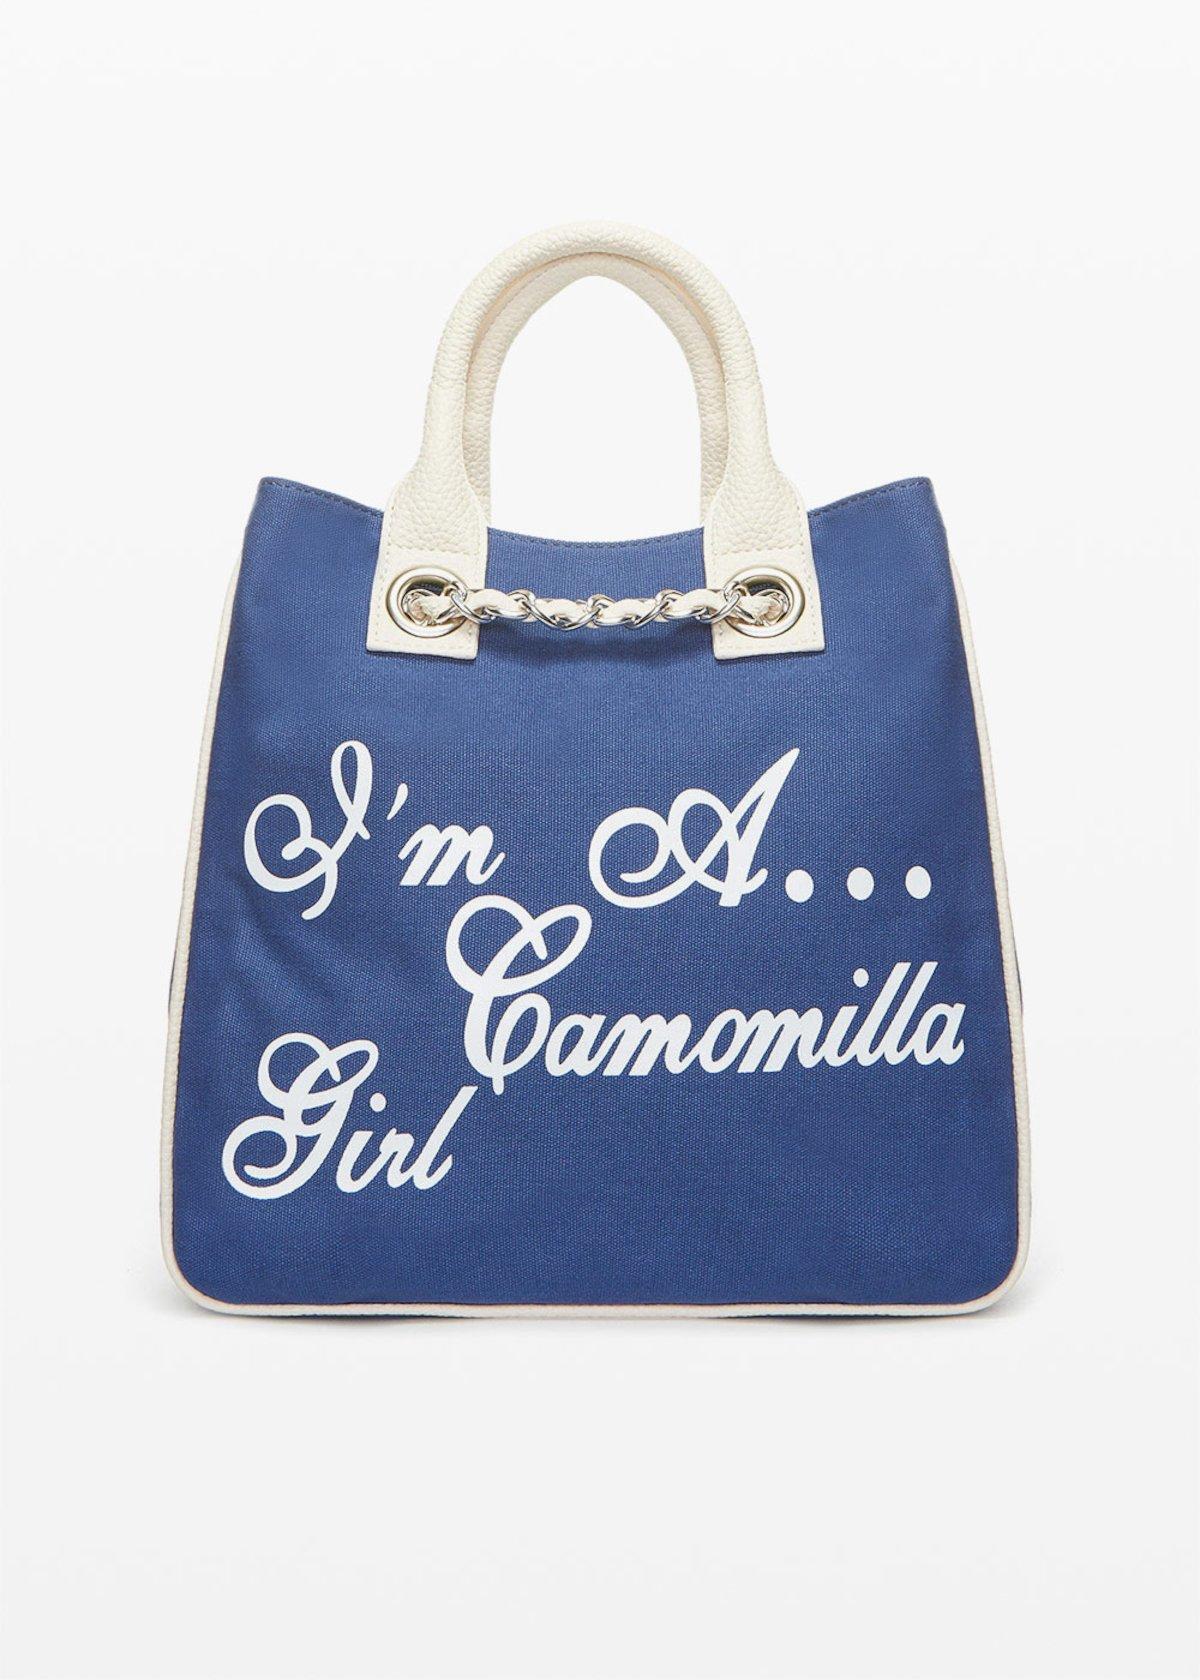 Mcamocanv canvas shopping bag - Avion / White - Woman